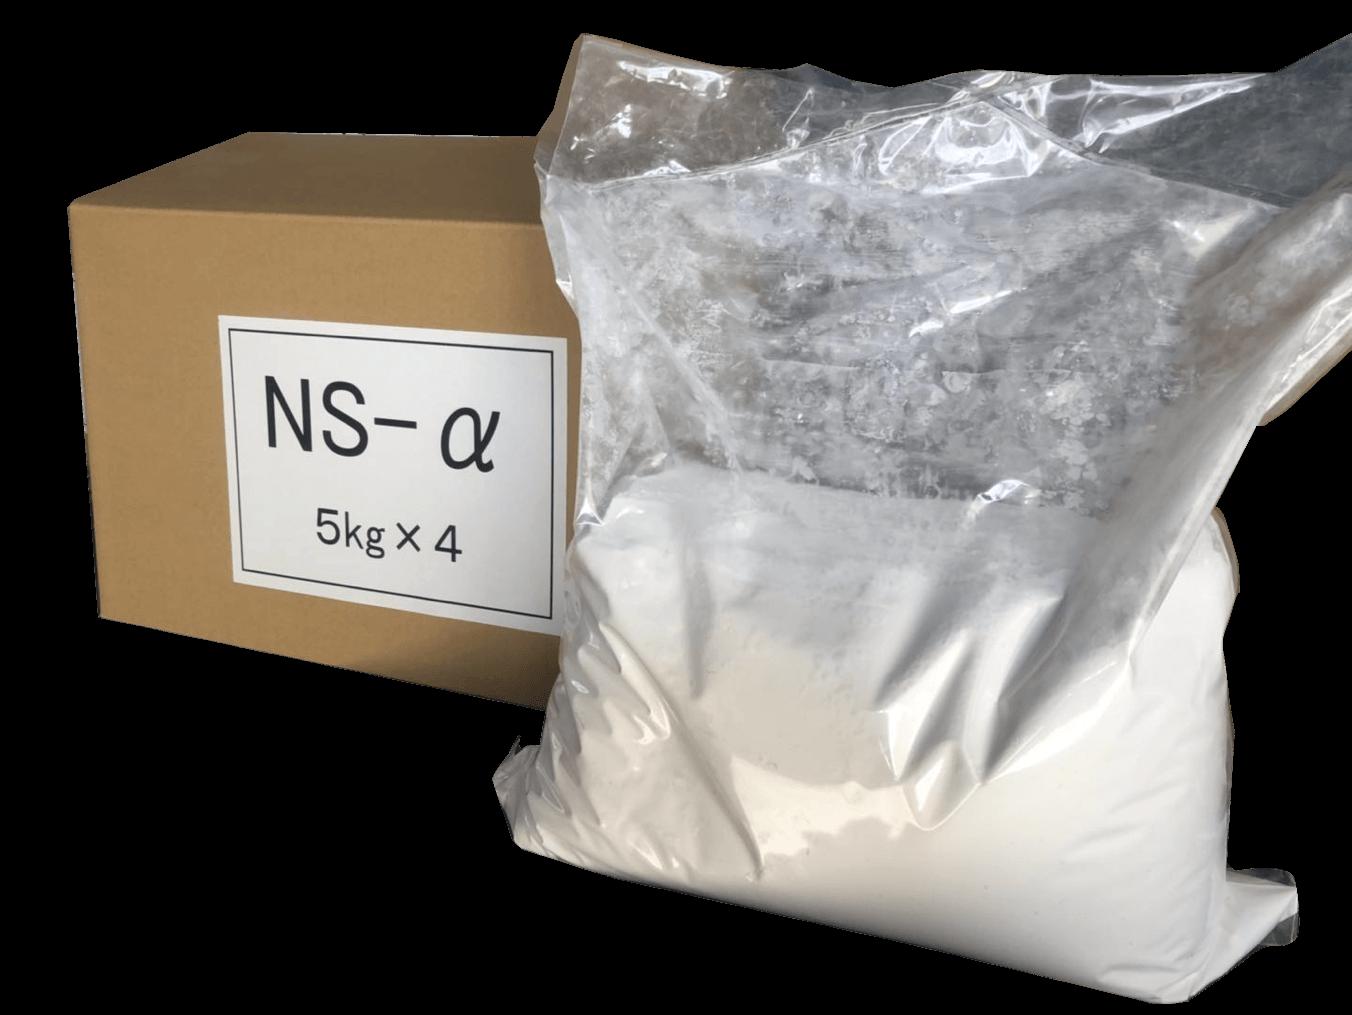 NS 乳酸菌 NS-α 家畜用乳酸菌飼料 社会的農業ラボ